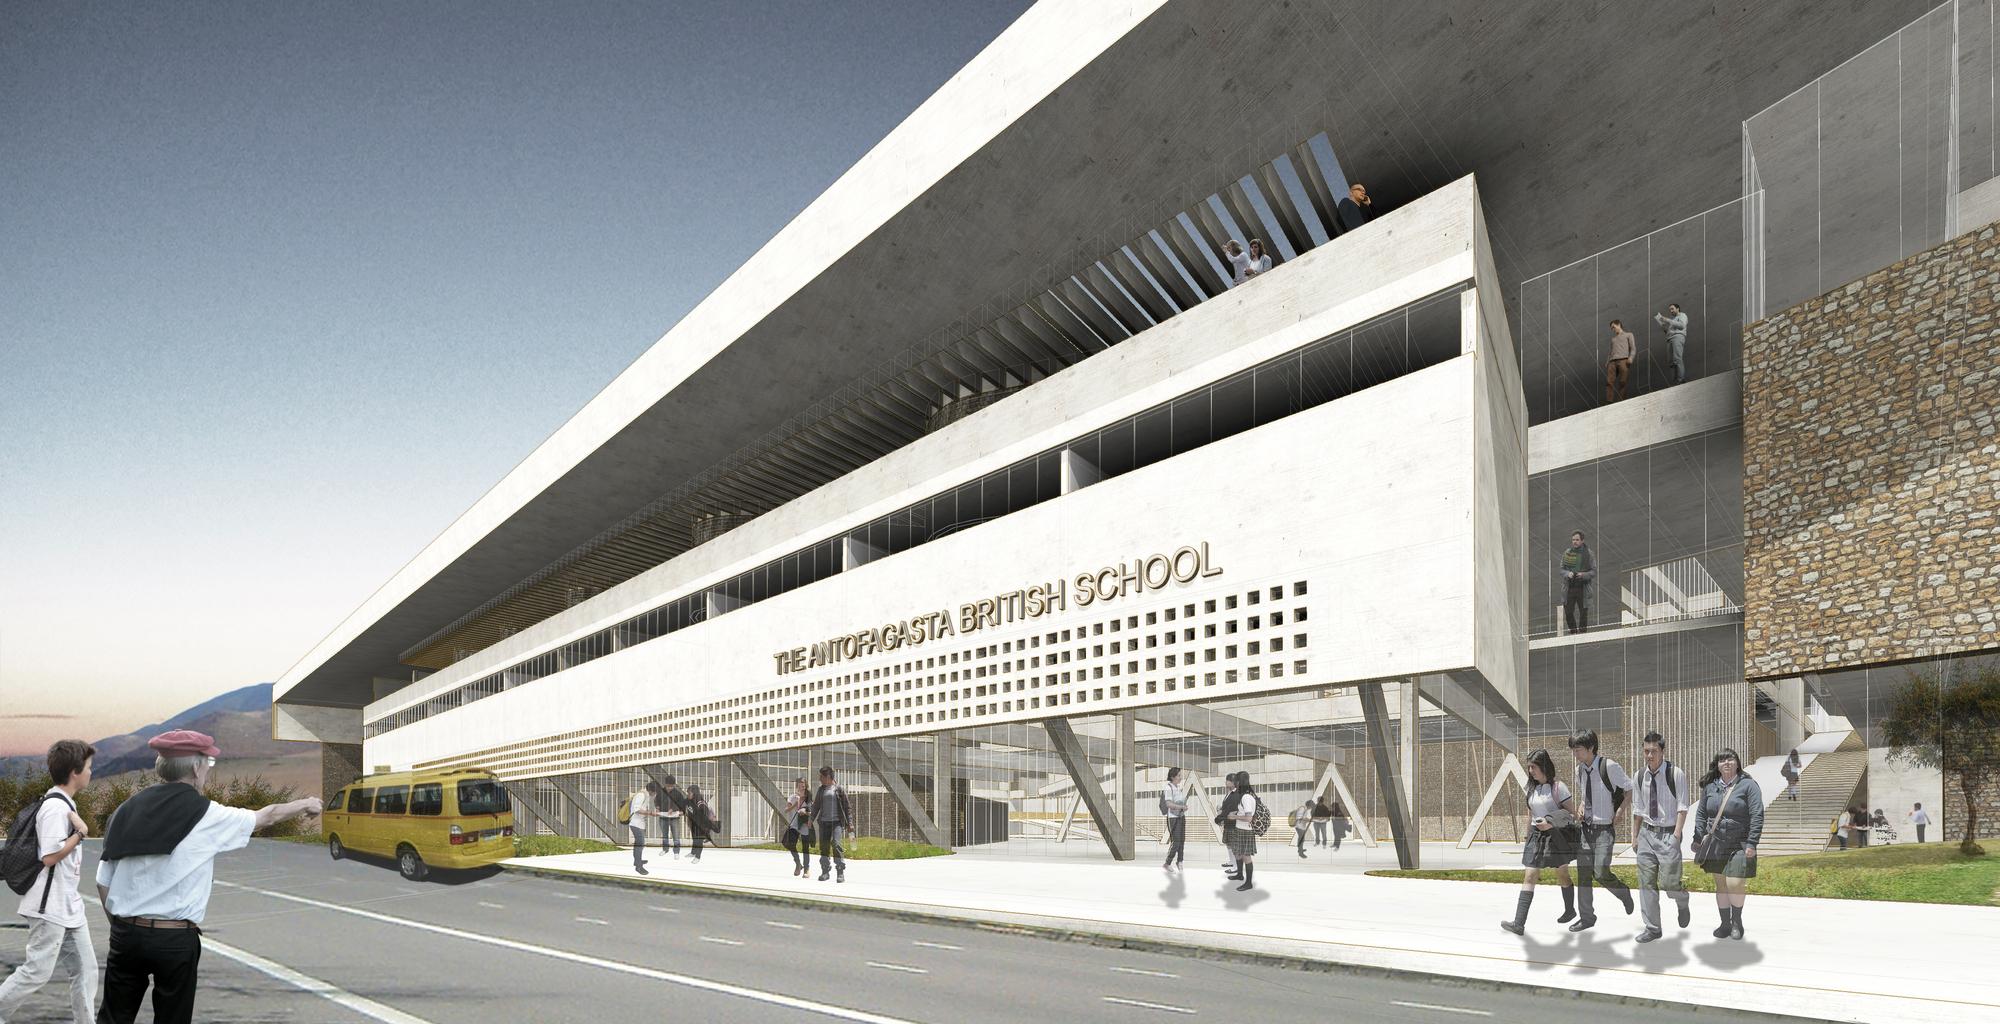 Murtinho raby arquitectos y araya arquitectos segundo for Universidades para arquitectura